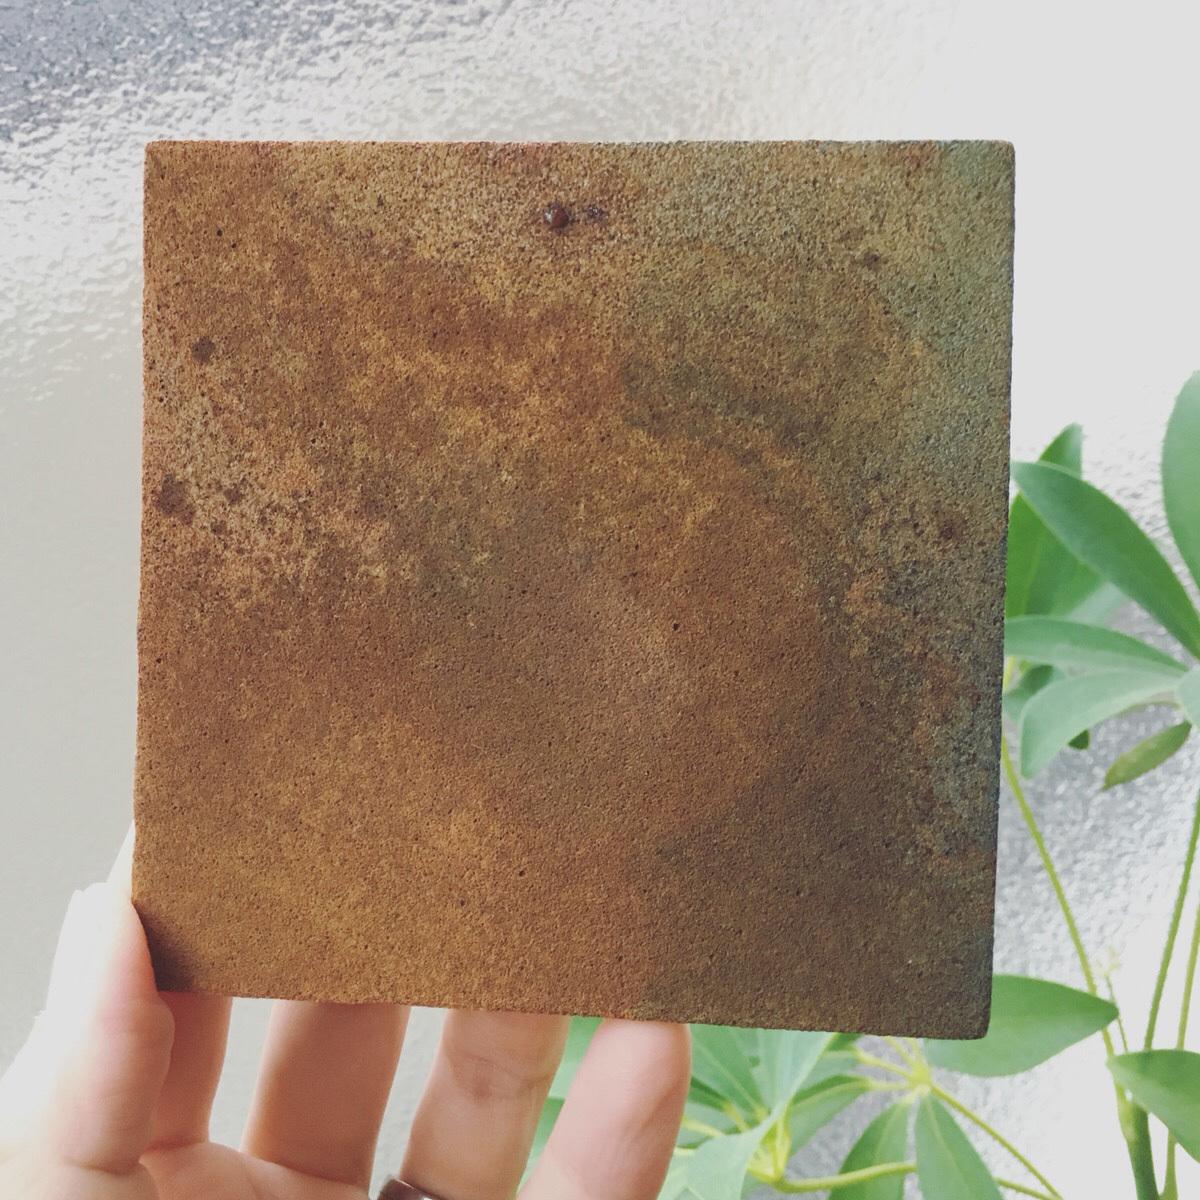 Fe Powder(鉄粉) 3kg - 画像5